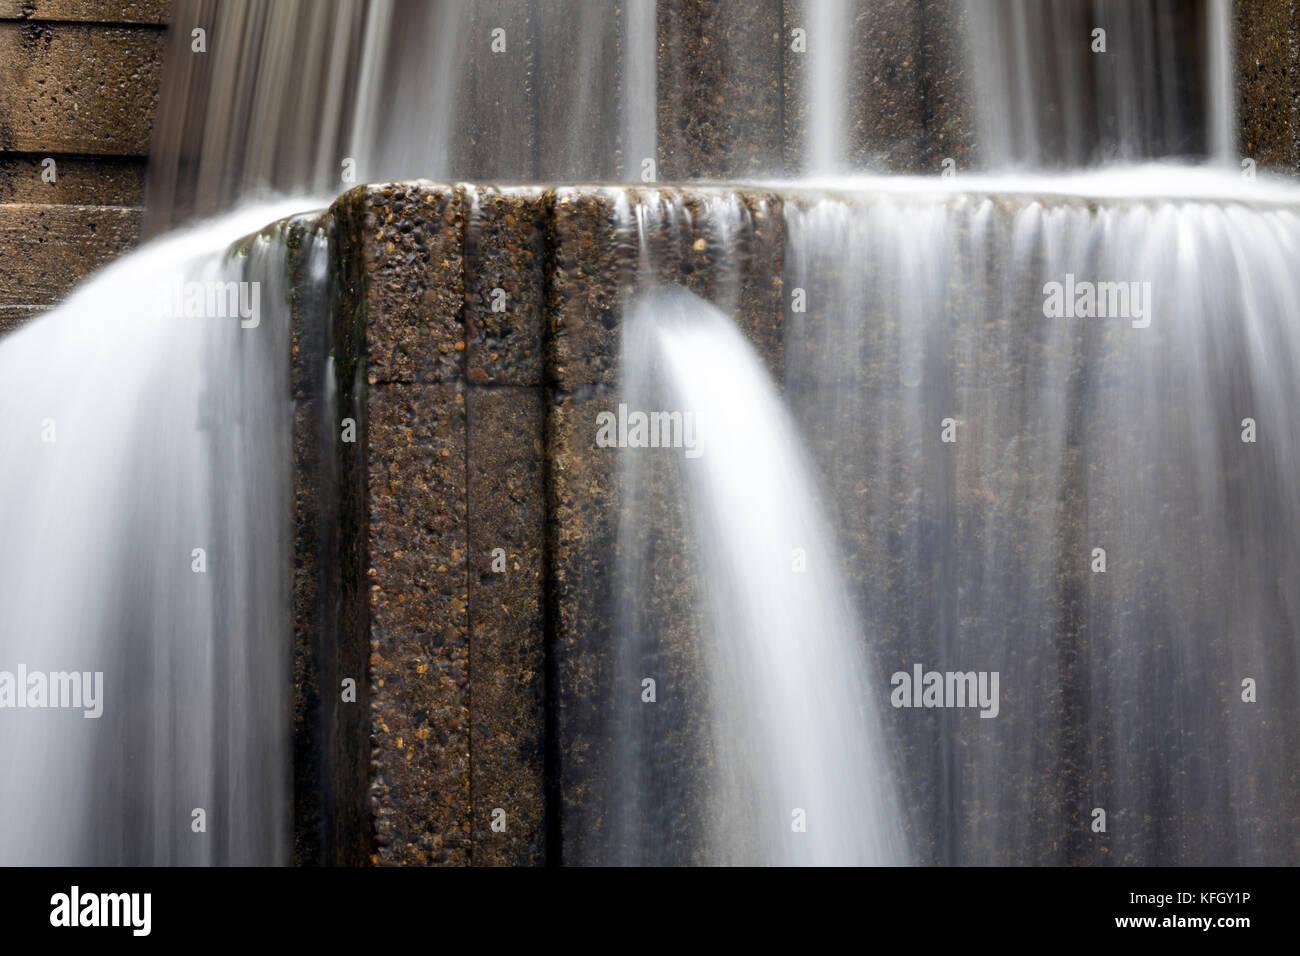 WA14177-00...WASHINGTON - Water feature at Freeway Park in Seattle. - Stock Image